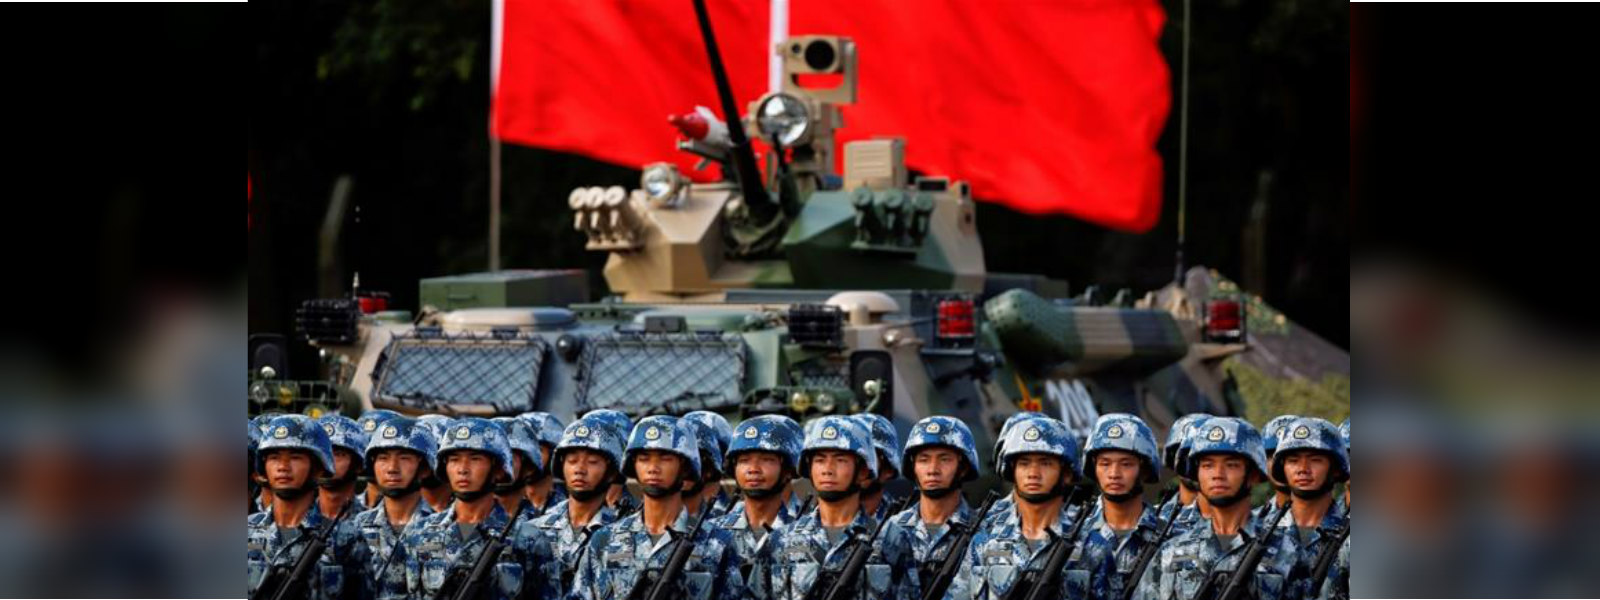 China rotates new batch of troops into Hong Kong